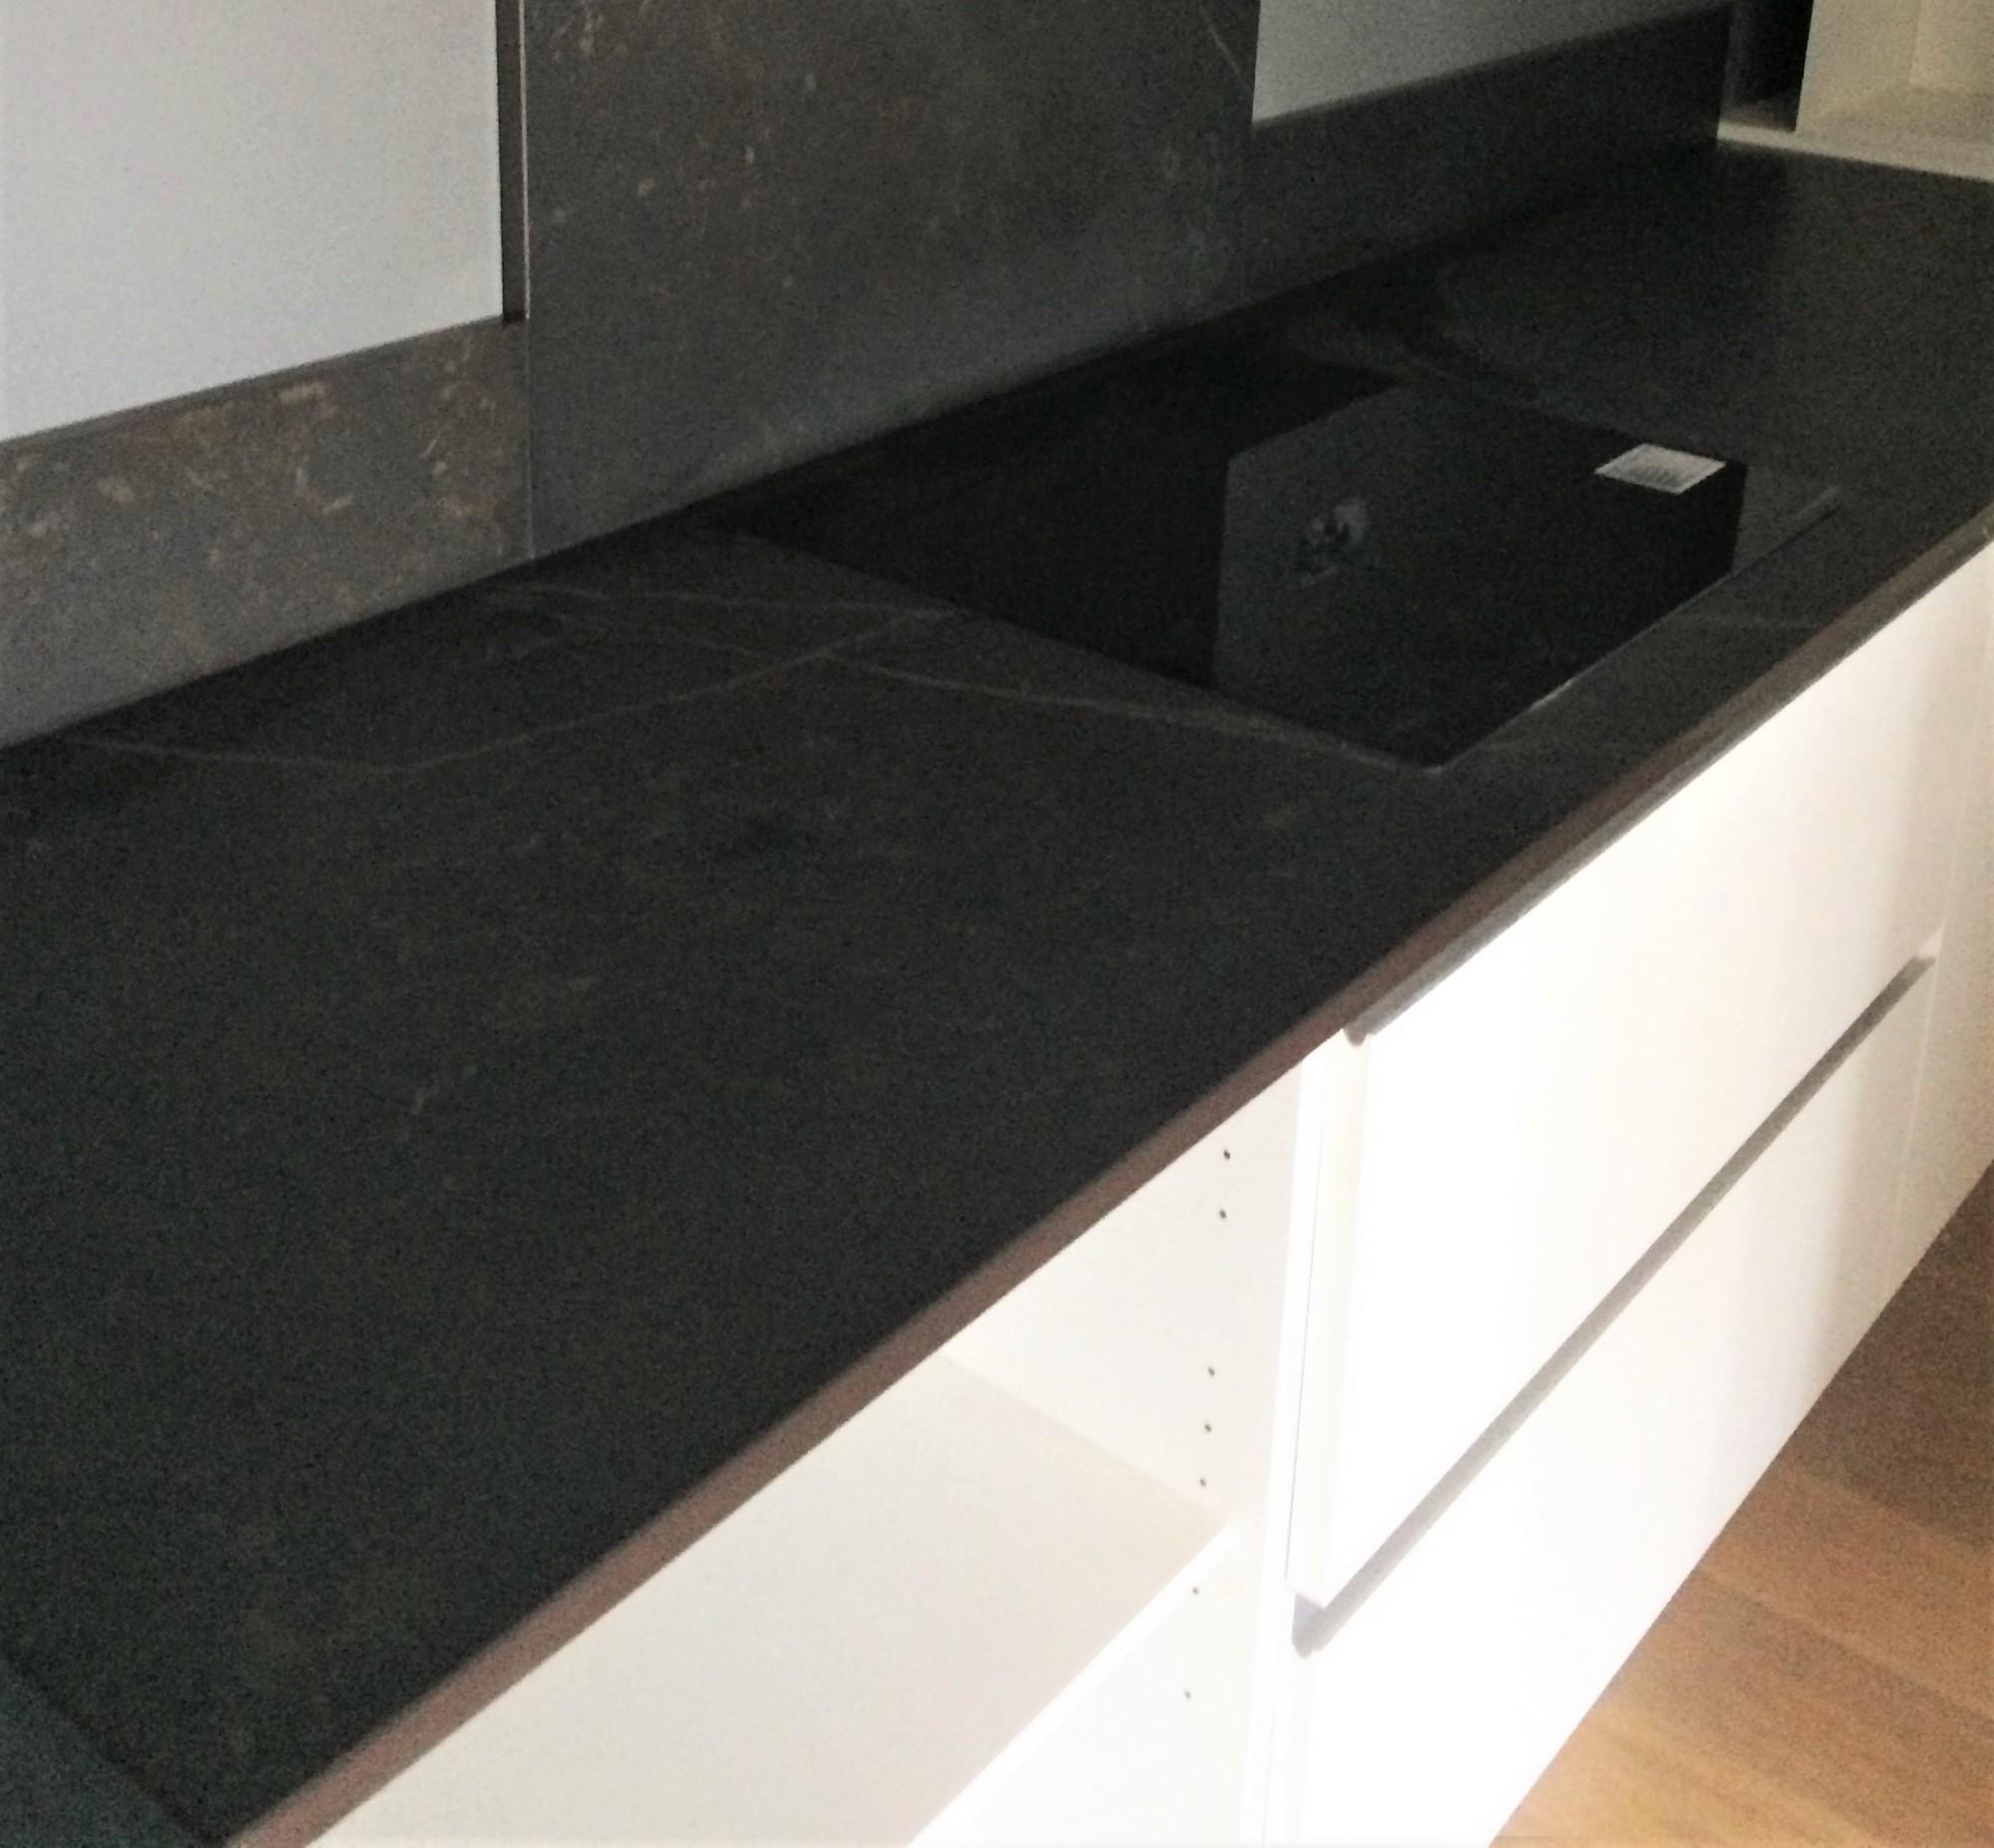 dekton kelya realisations hm deco bordeaux hm deco. Black Bedroom Furniture Sets. Home Design Ideas